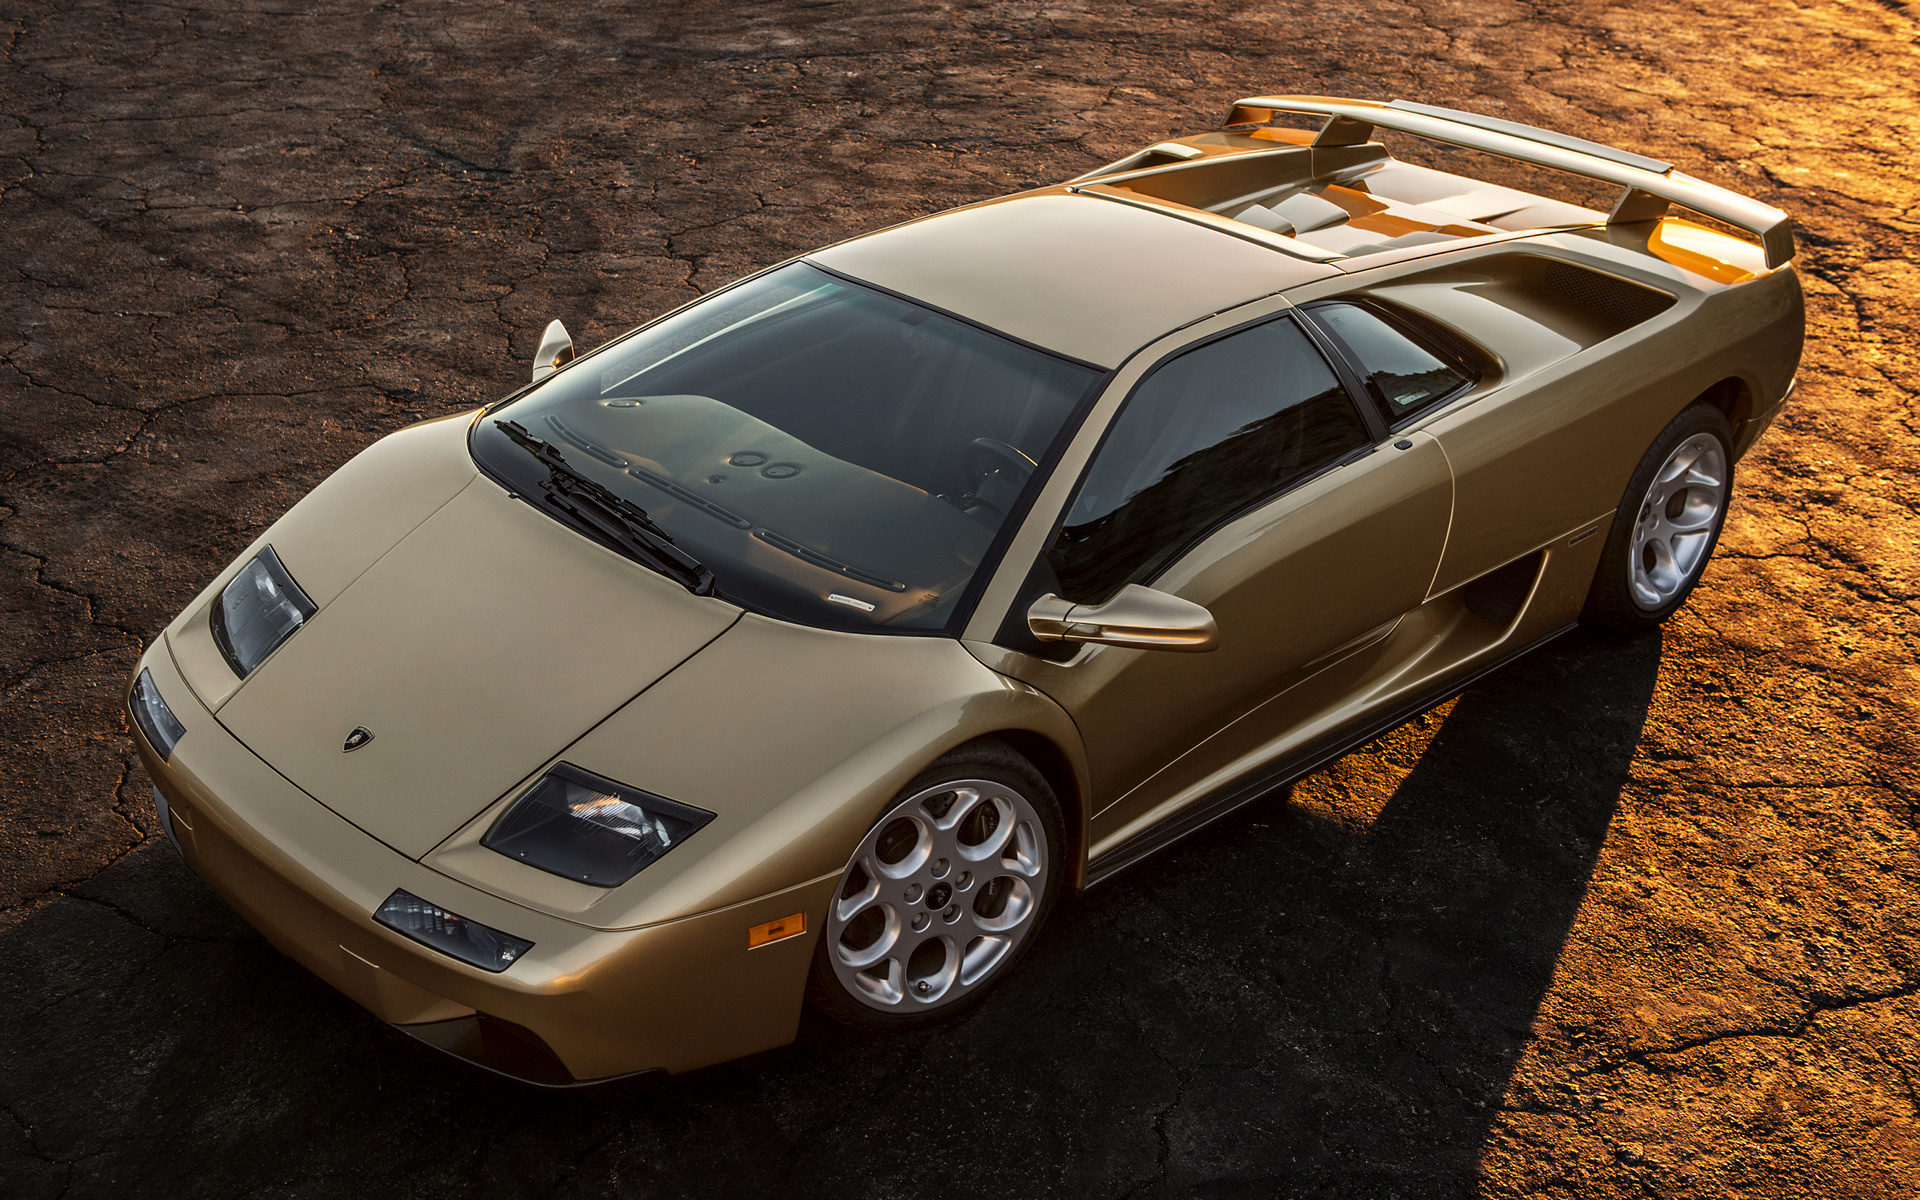 2001 Lamborghini Diablo Vt 6 0 Se Us Wallpapers And Hd Images